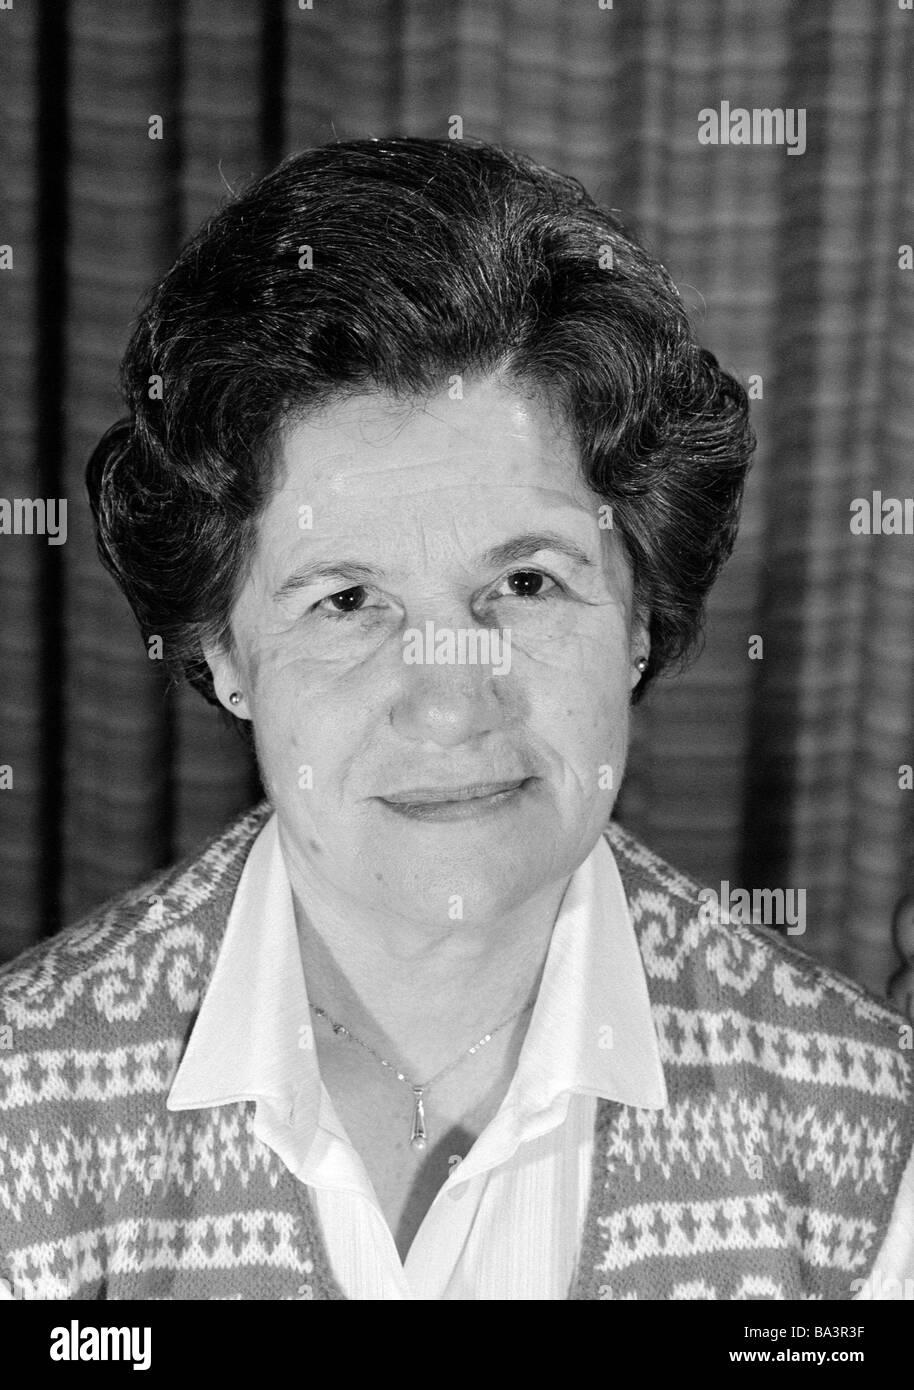 Eighties, black and white photo, people, elder woman, portrait, aged 60 to 70 years, Frieda Stock Photo